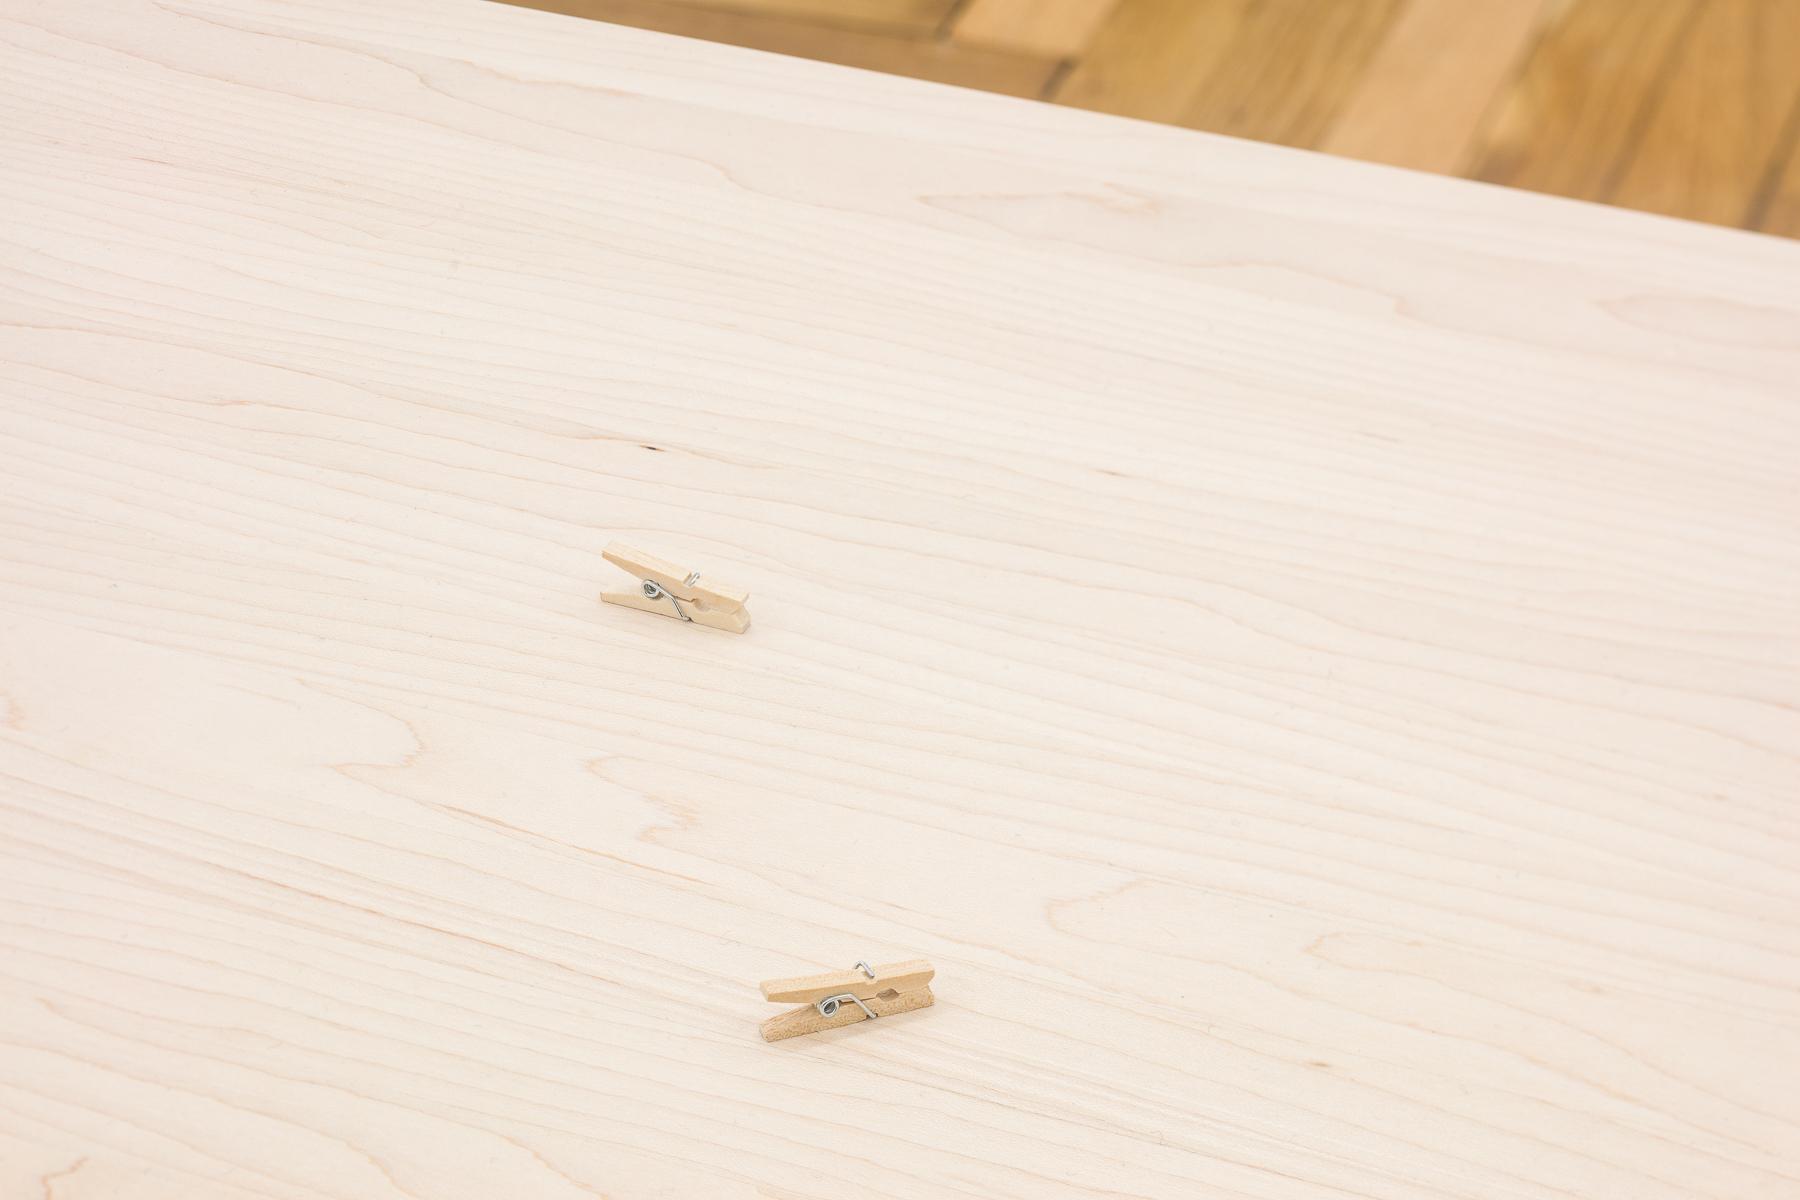 2019_01_25_Knut Ivar Aaser at Felix Gaudlitz_by kunst-dokumentationcom_023_web.jpg